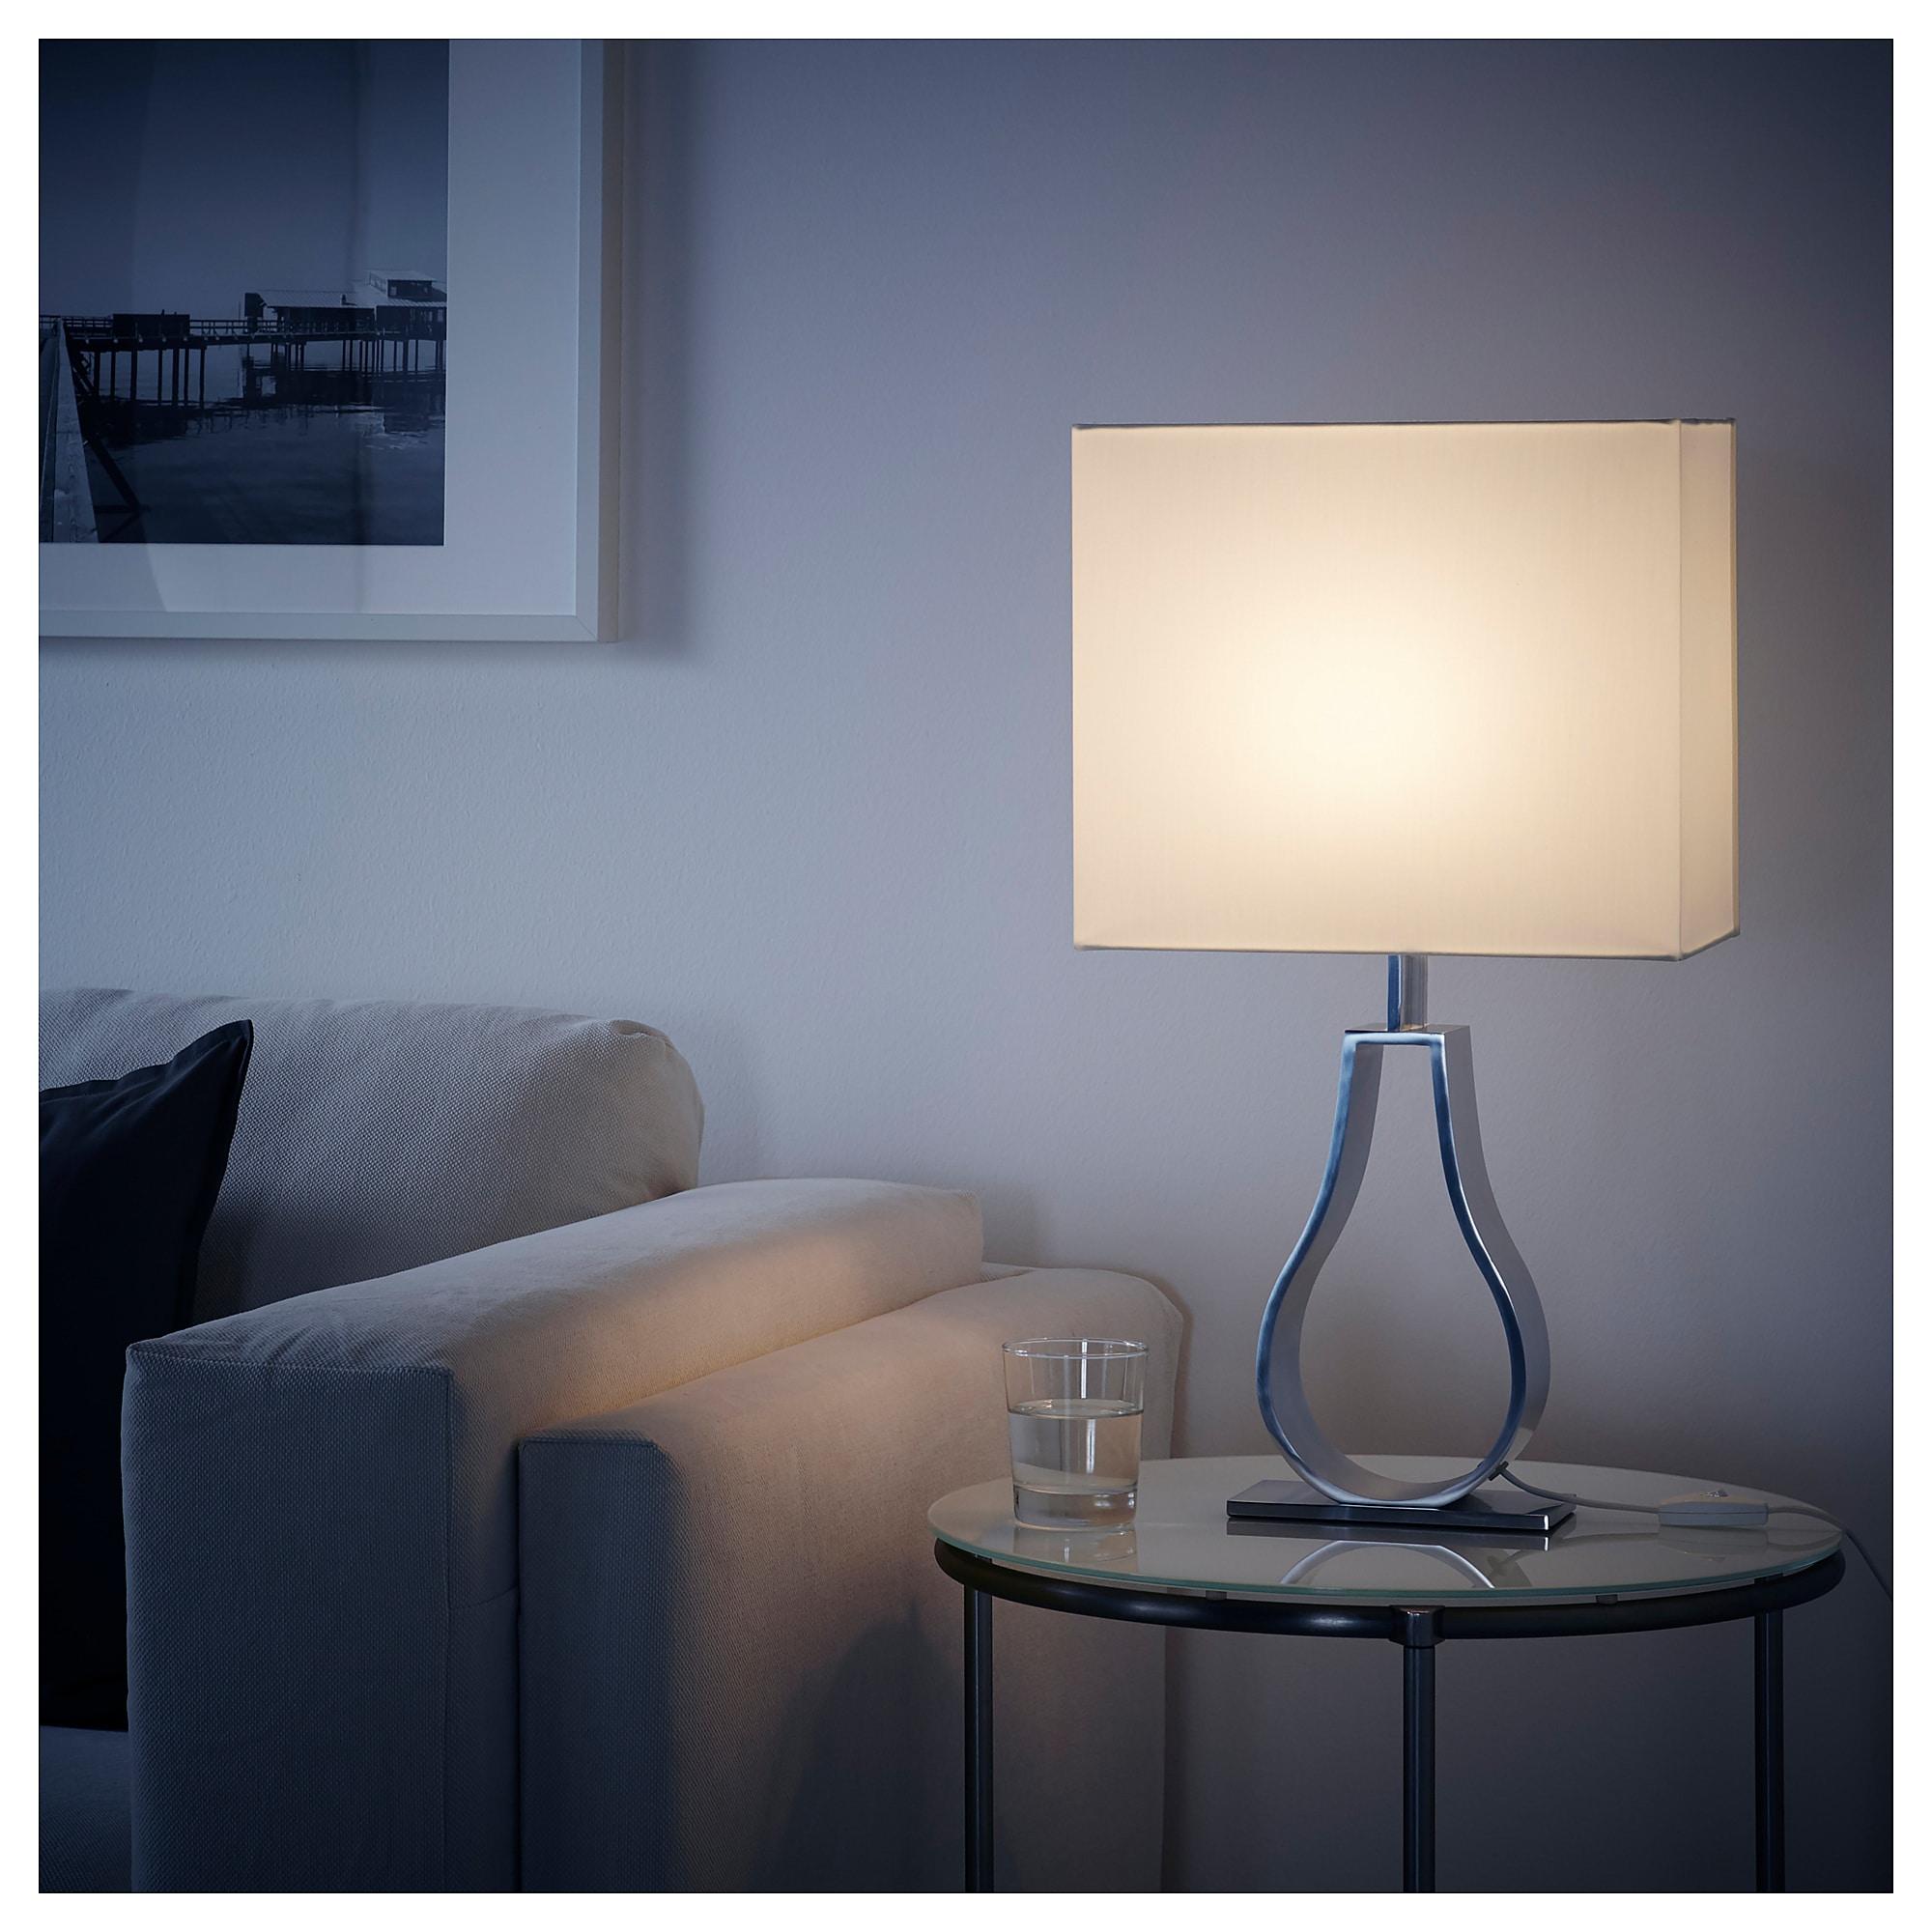 Ikea Klabb Table Lamp Off White Nickel Plated